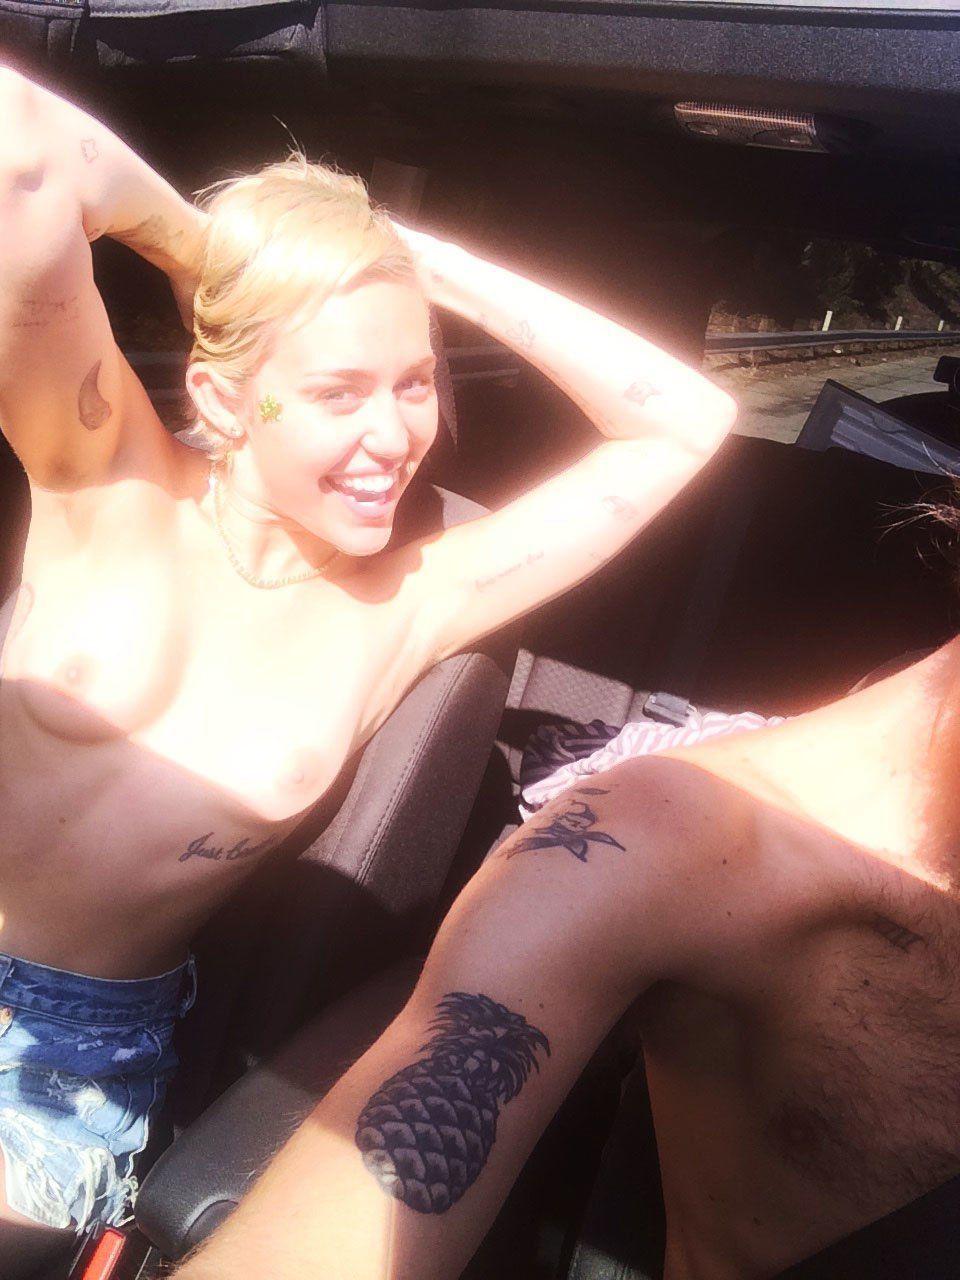 Miley upskirt snap